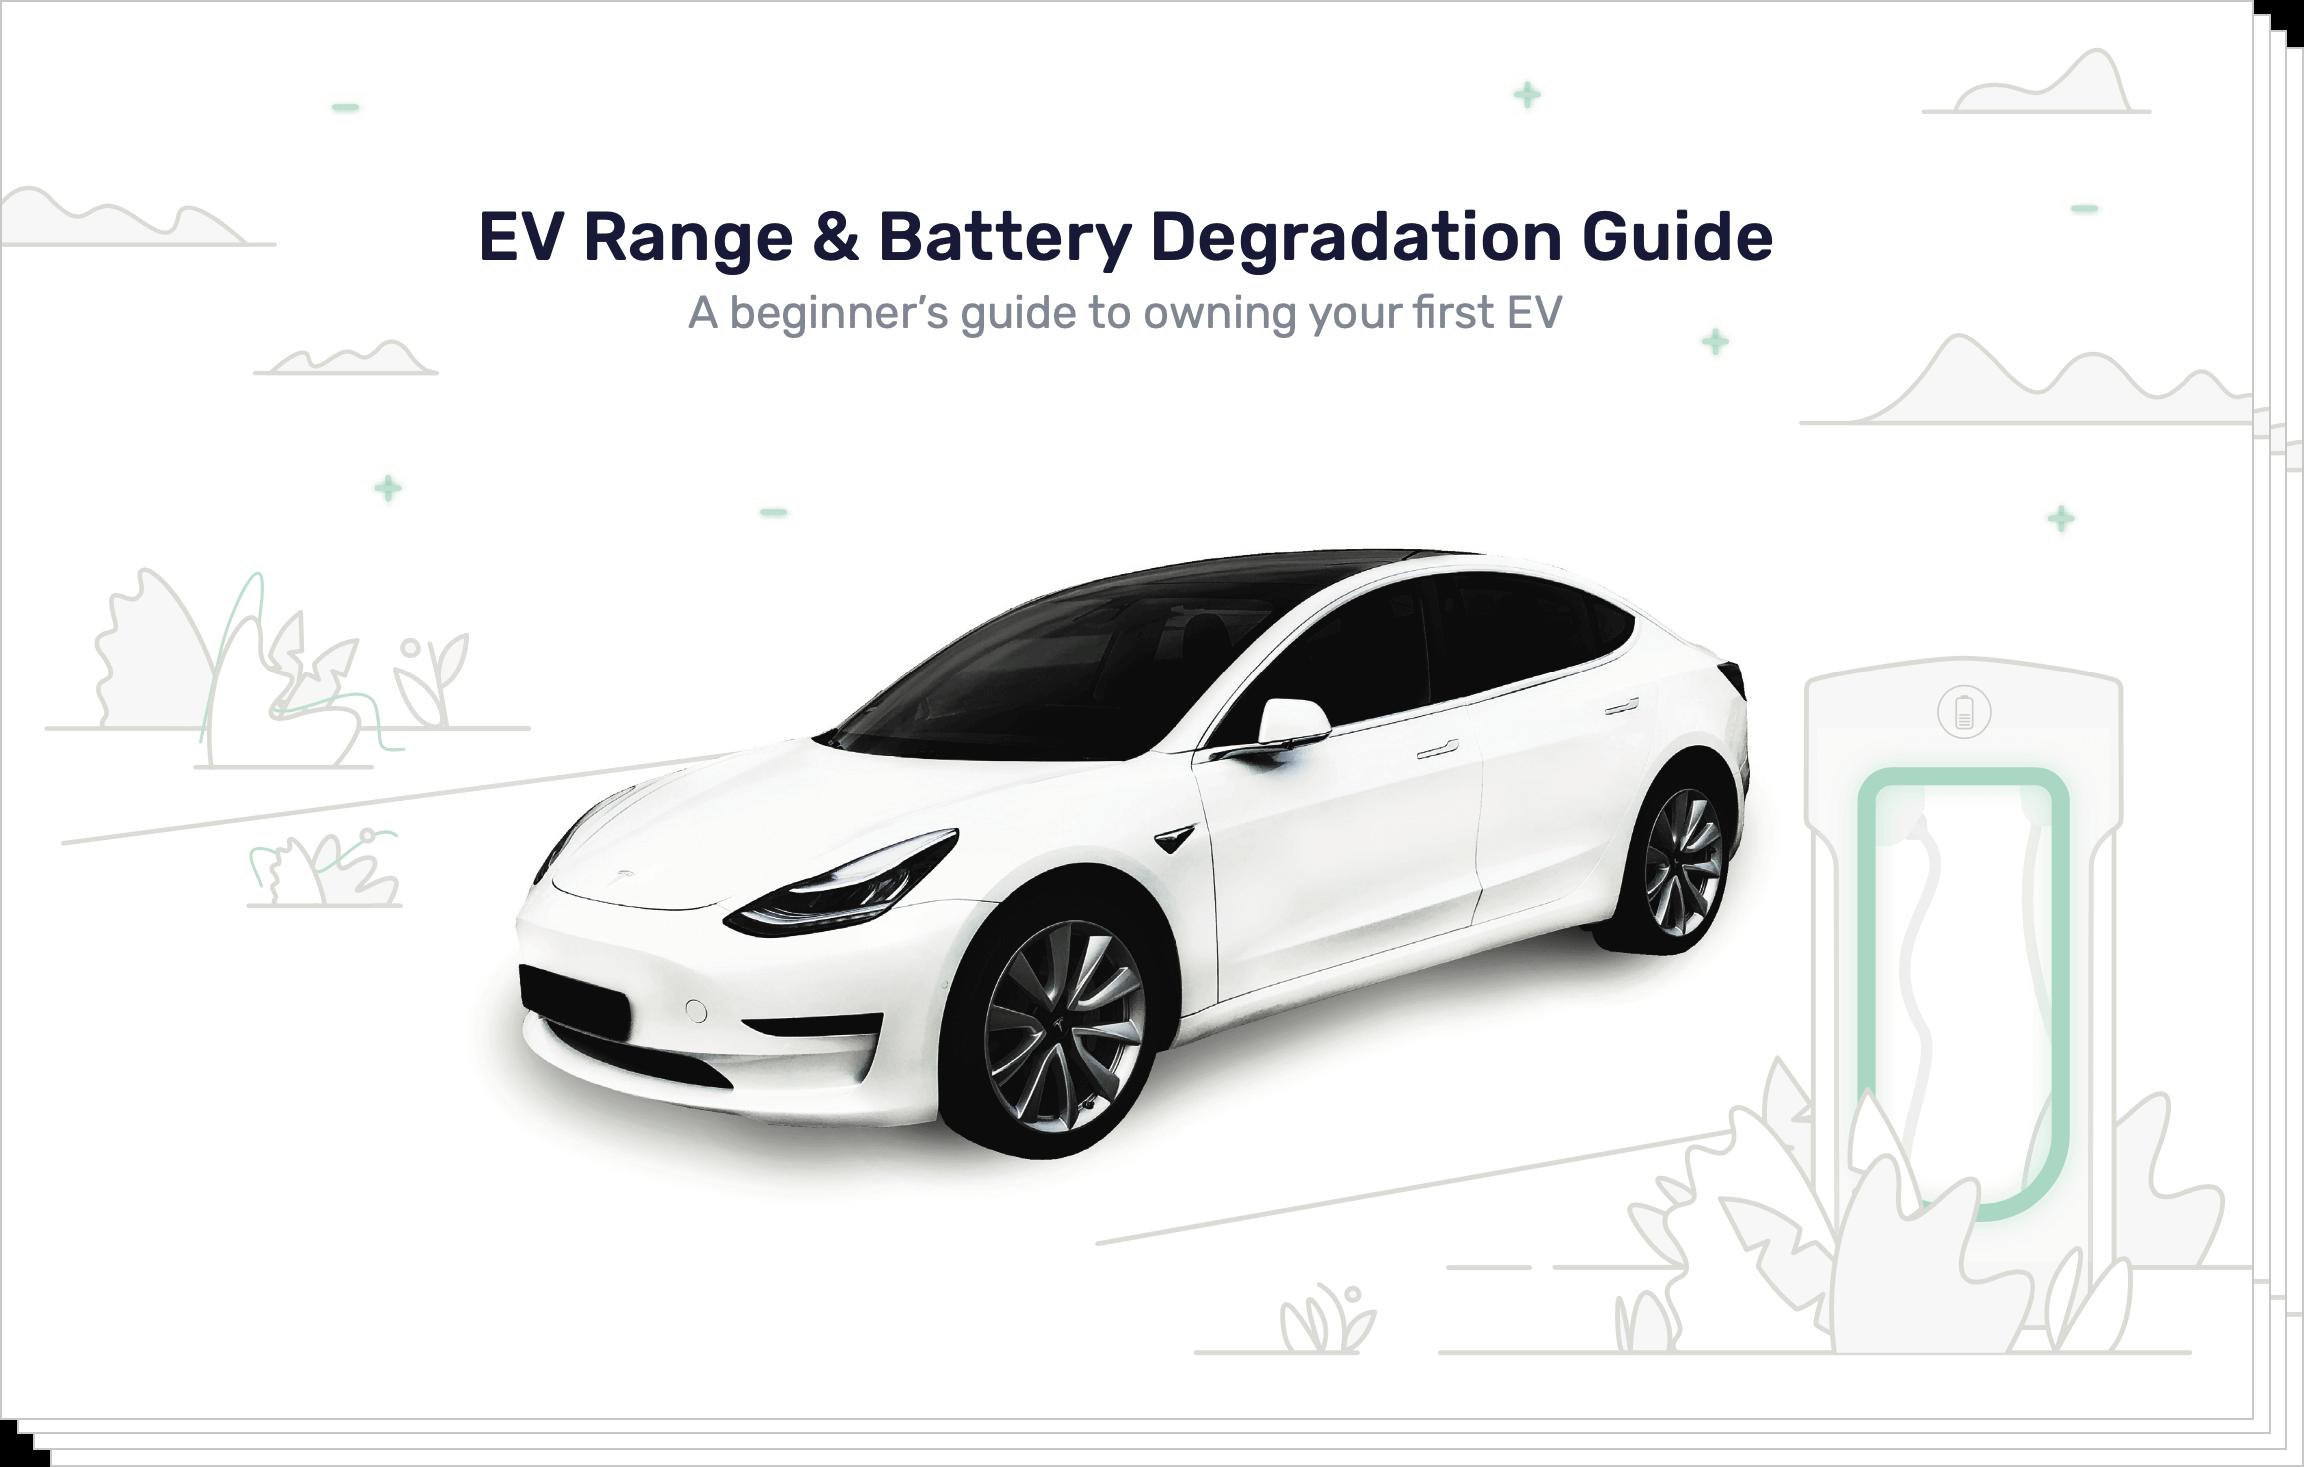 EV range e-book cover